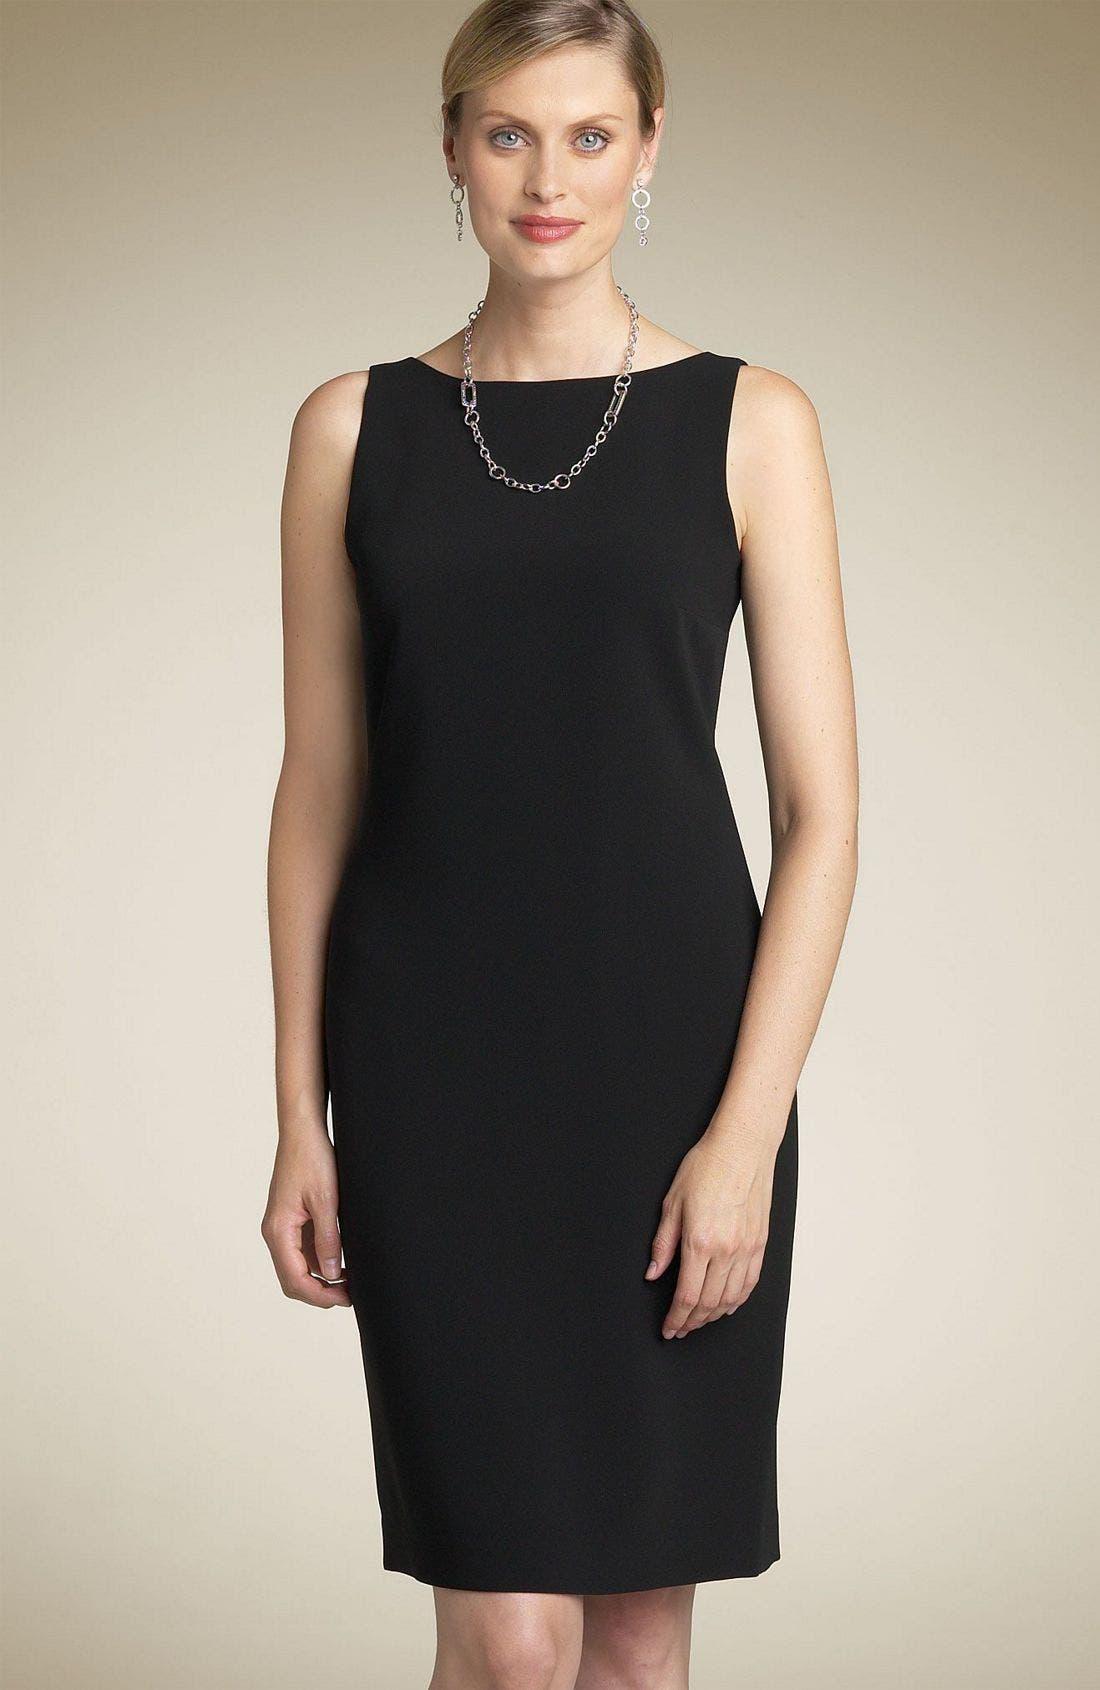 Alternate Image 1 Selected - Louben Sheath Dress (Petite)